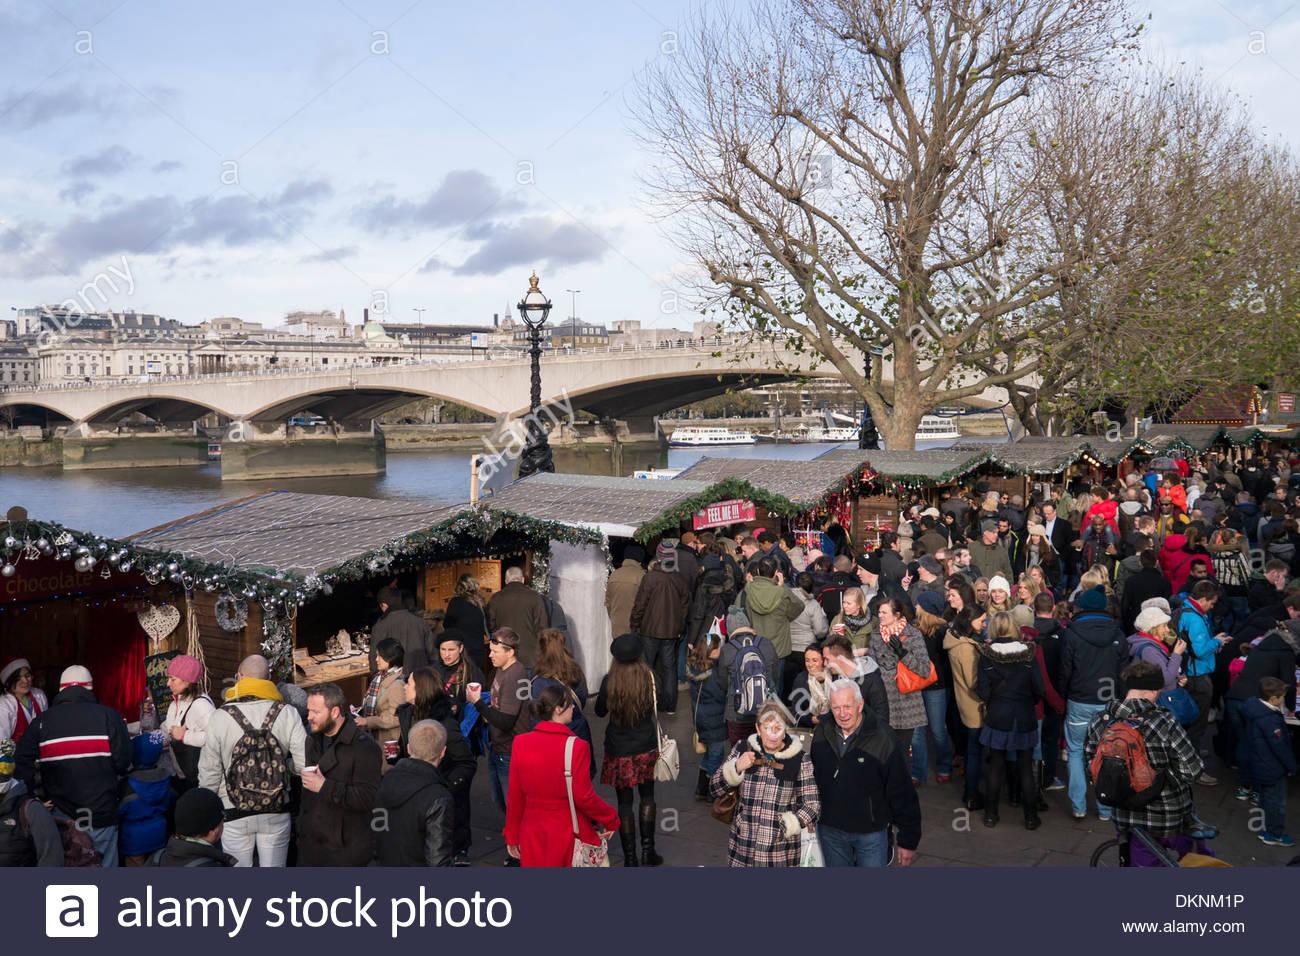 People enjoying the Christmas Market stalls on the South Bank: London. - Stock Image